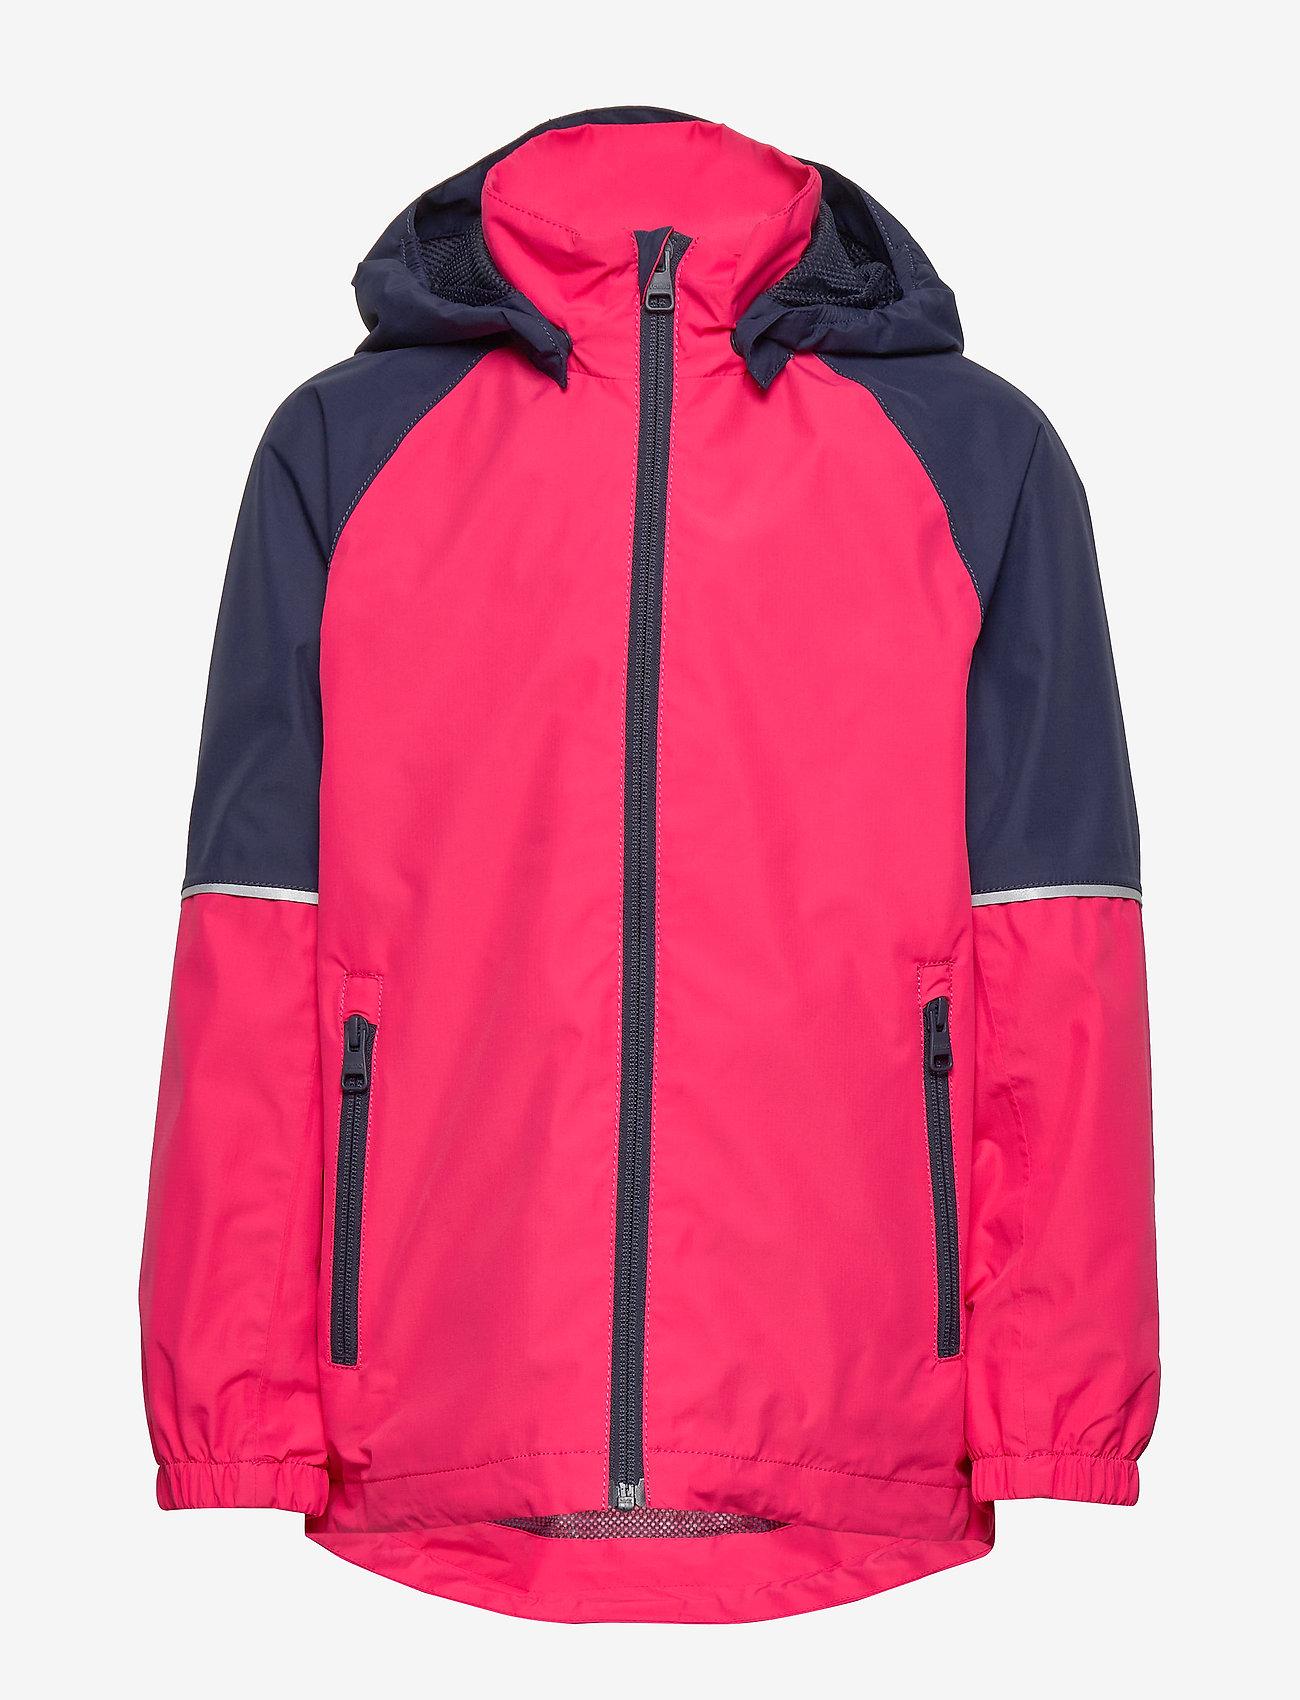 Reima - Fiskare - shell jacket - berry pink - 0